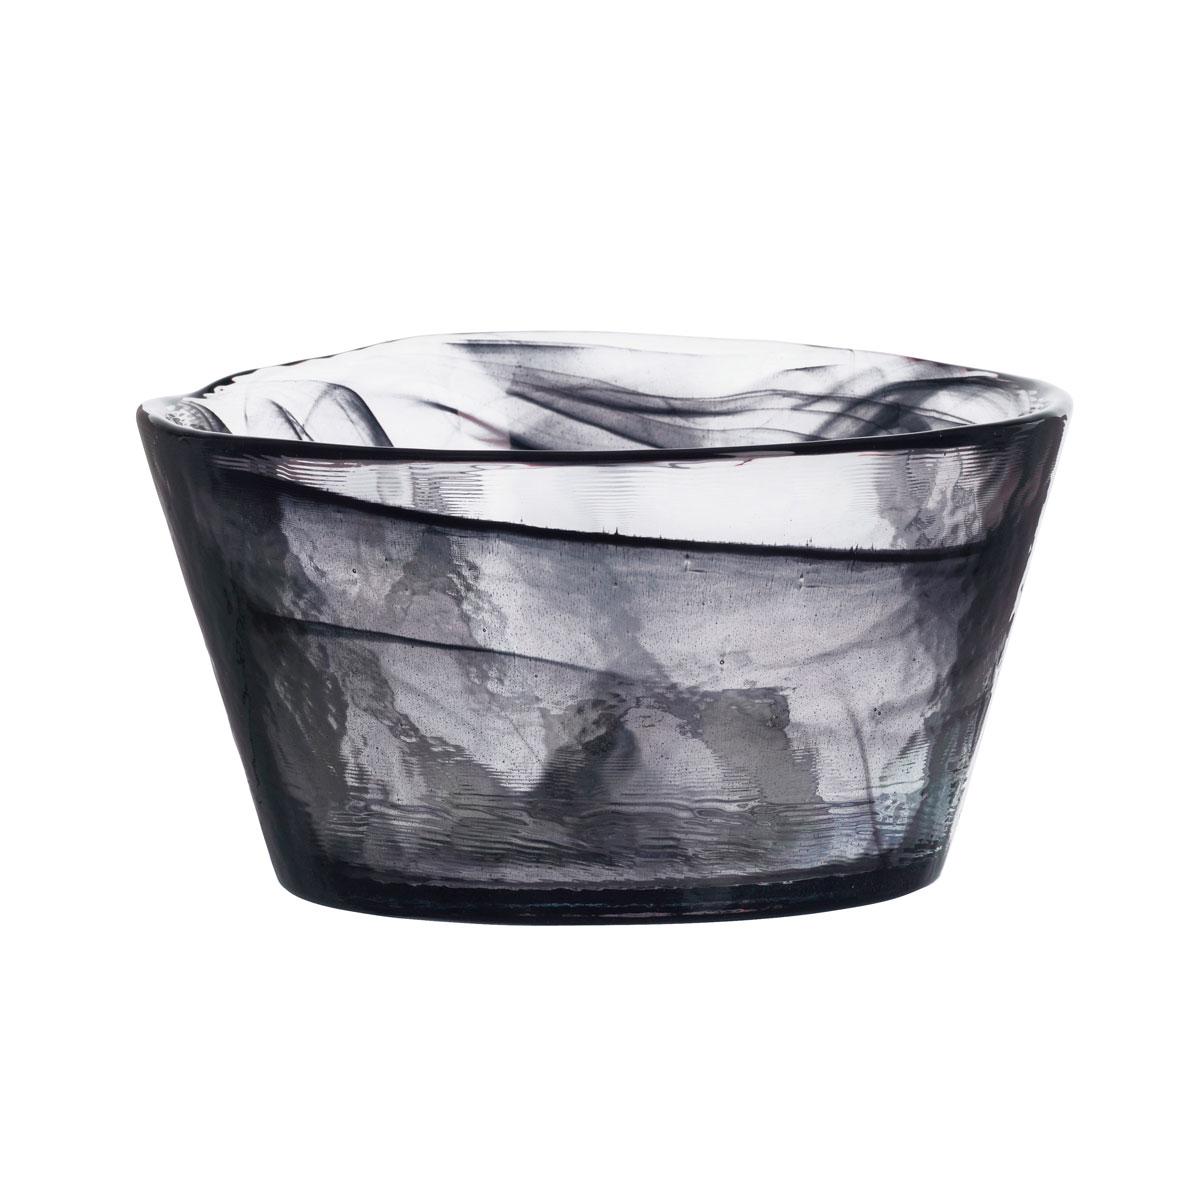 "Kosta Boda Crystal Mine Black 5.25"" Bowl"